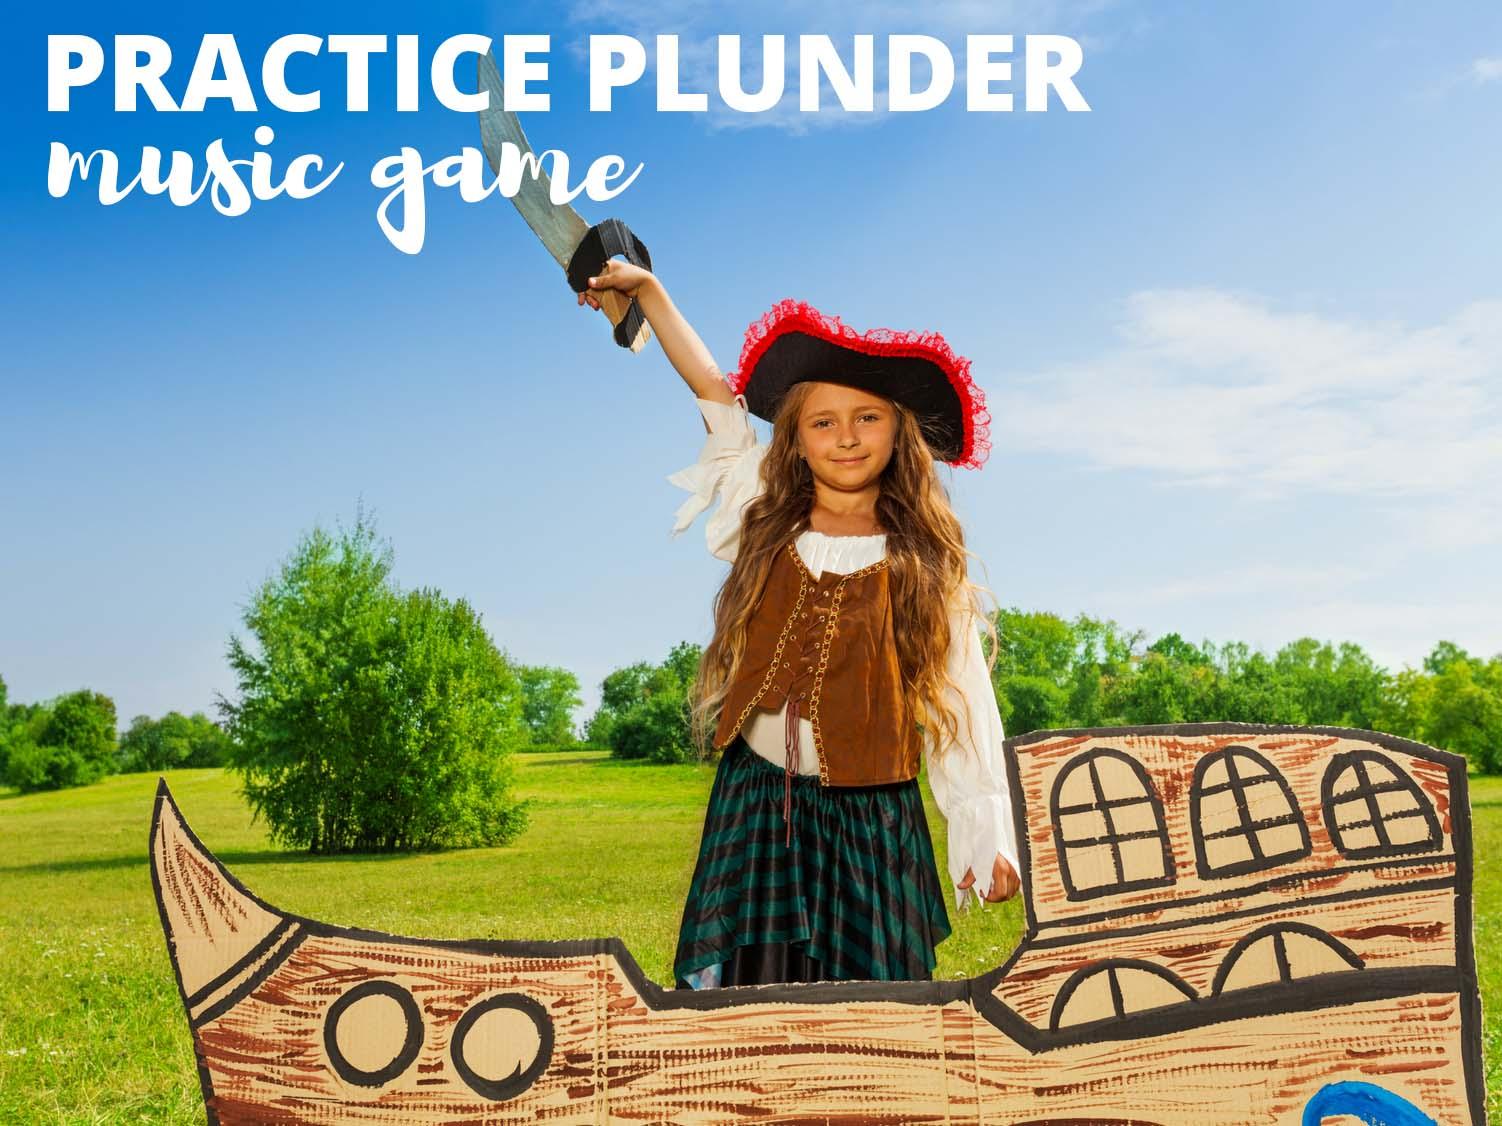 Practice Plunder